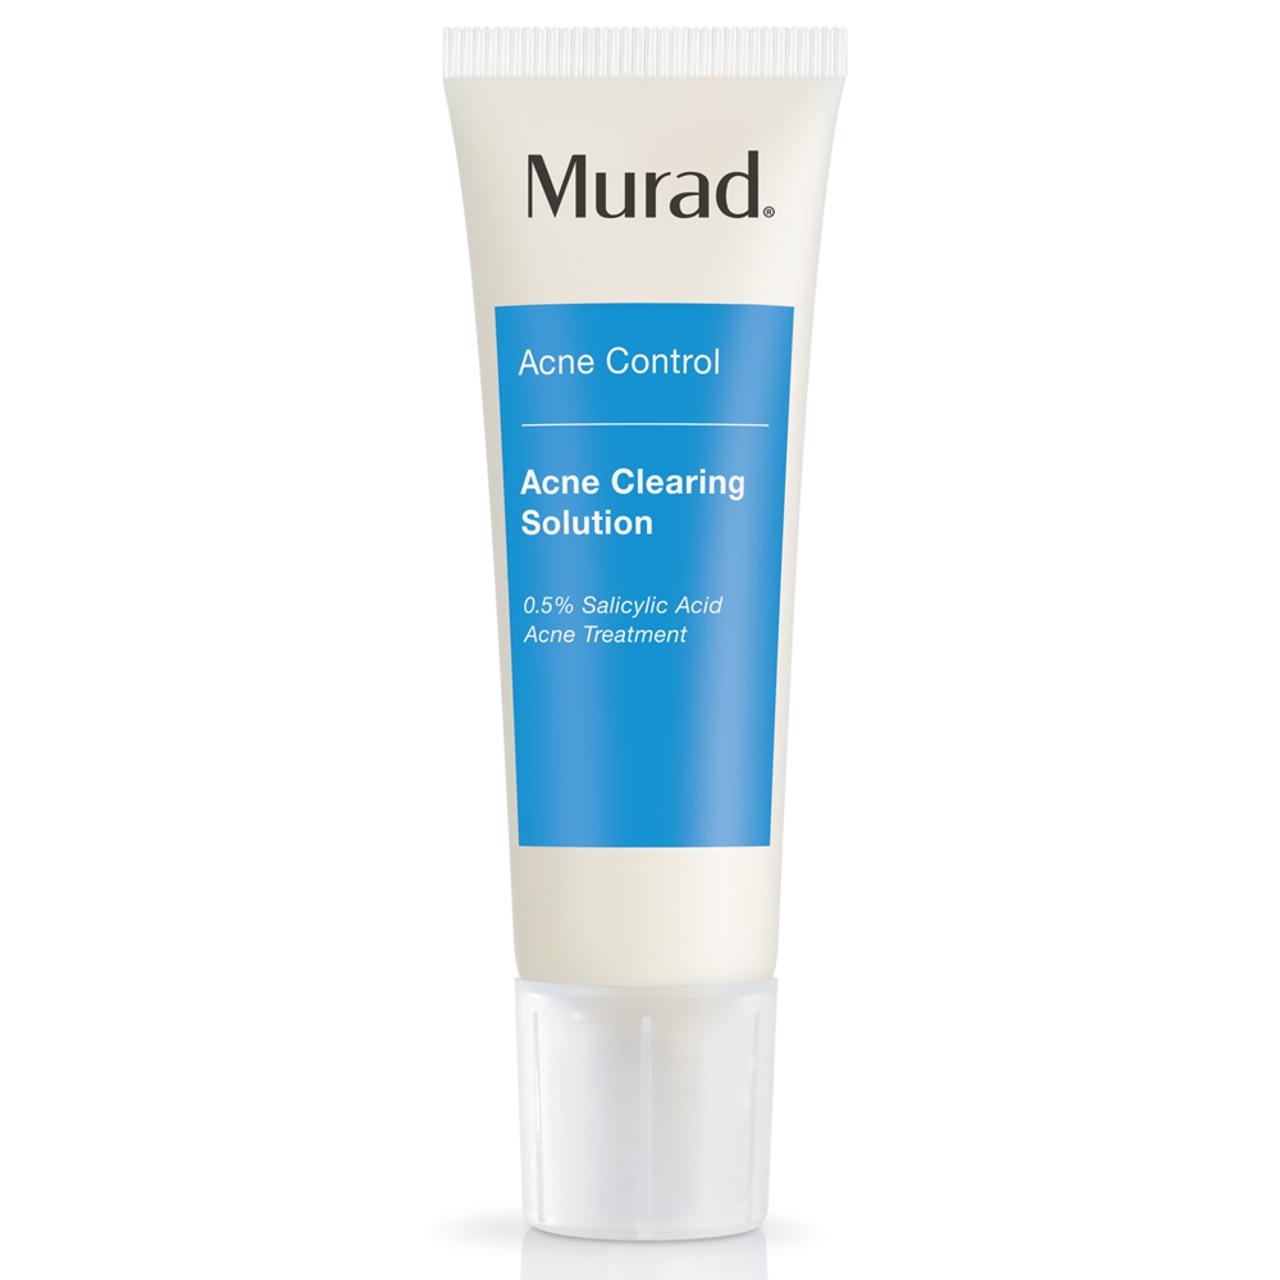 Murad Acne Control Acne Clearing Solution BeautifiedYou.com